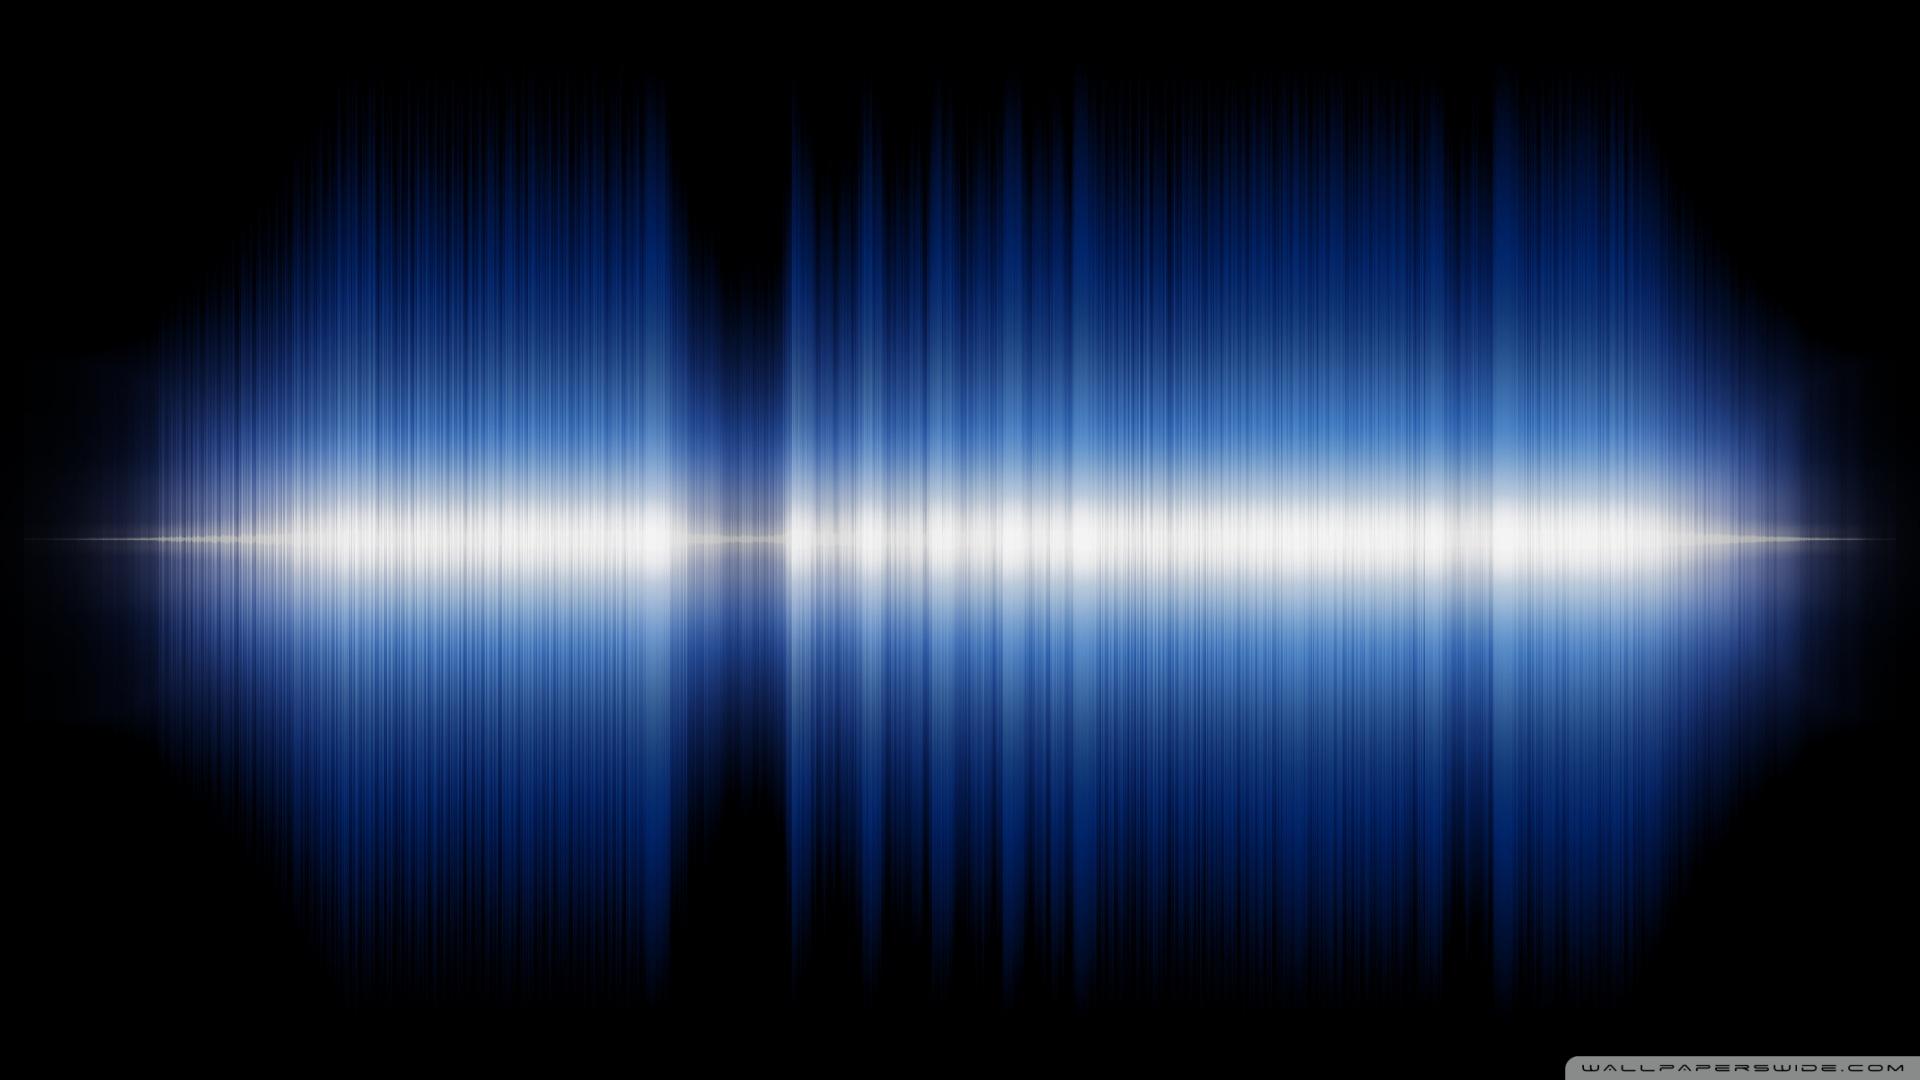 Dual Monitor Animated Wallpaper Audio Sound Wave 4k Hd Desktop Wallpaper For 4k Ultra Hd